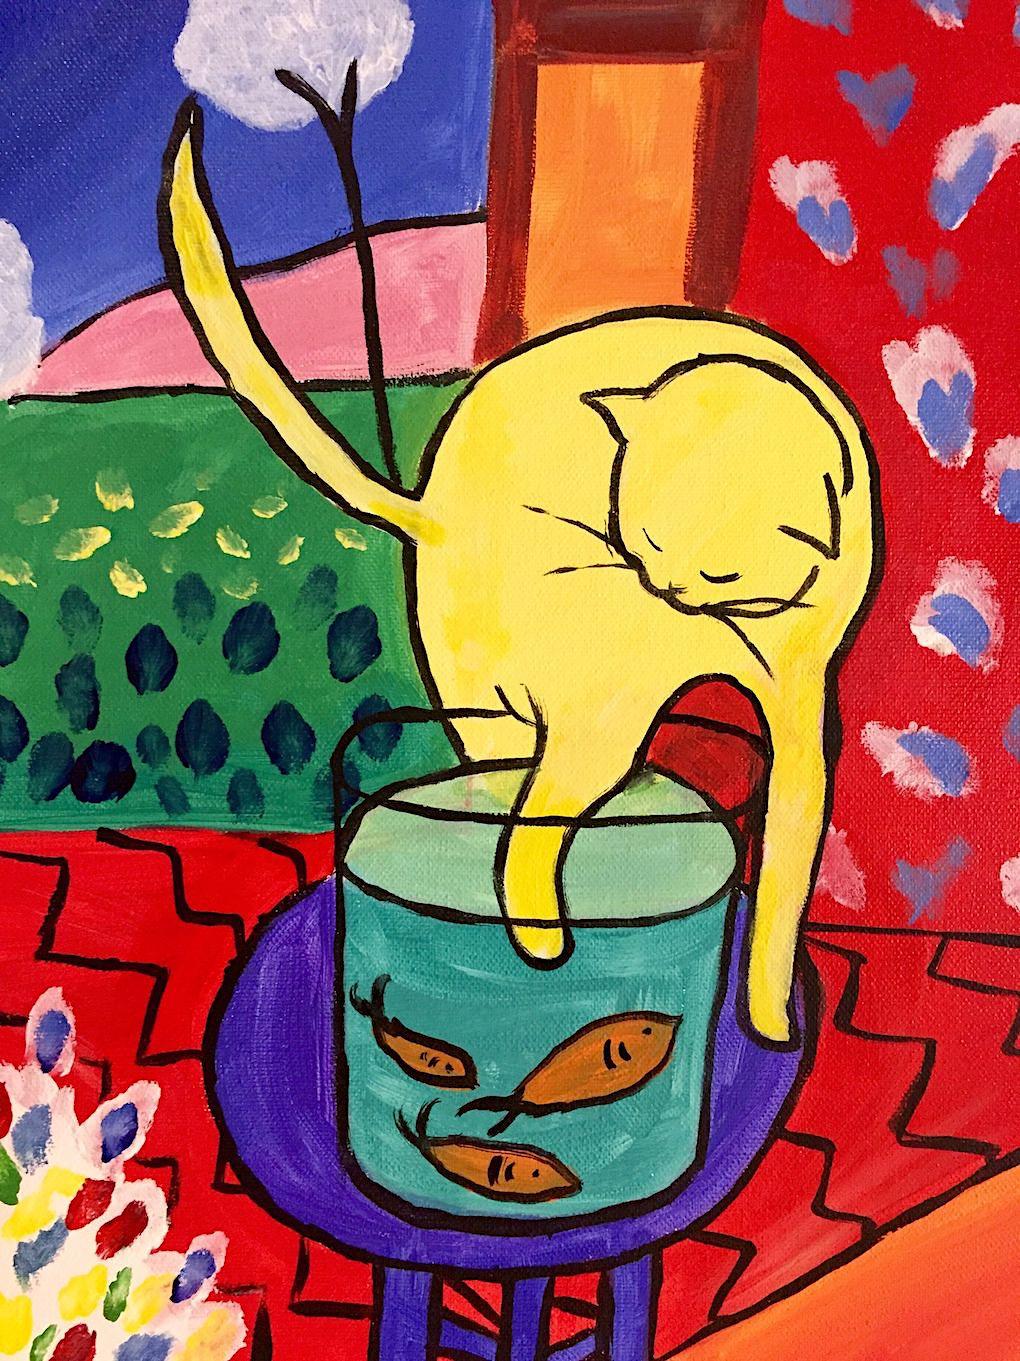 A Still Life Collection Henri Matisse 1869 1954 Chat Aux Poissons Rouges